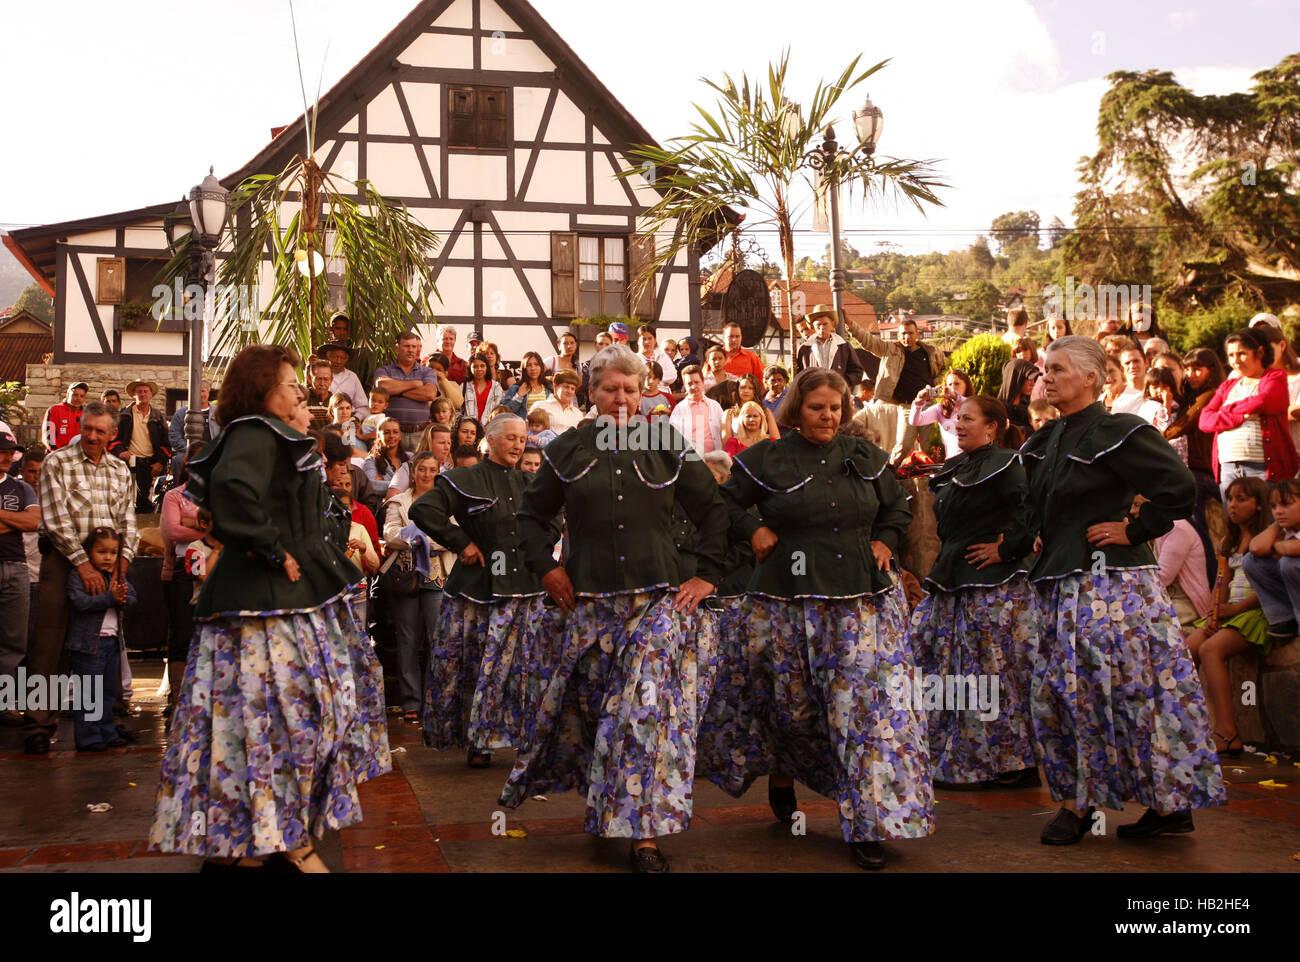 Traditions venezuela festivals and Travel Blog